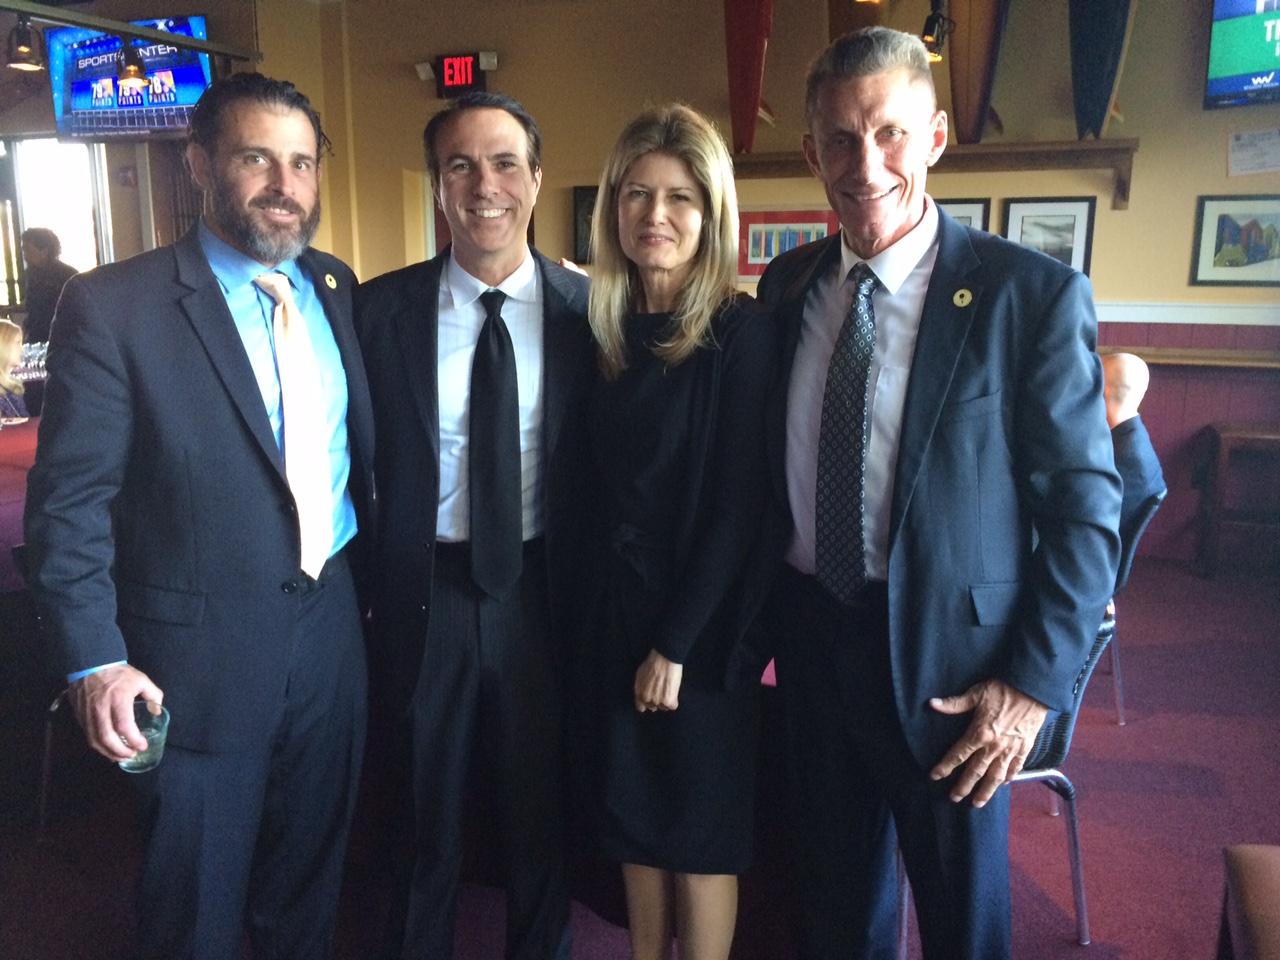 Kerry Patton, Tim Lynch, Fawn Hall and Jason Amerine